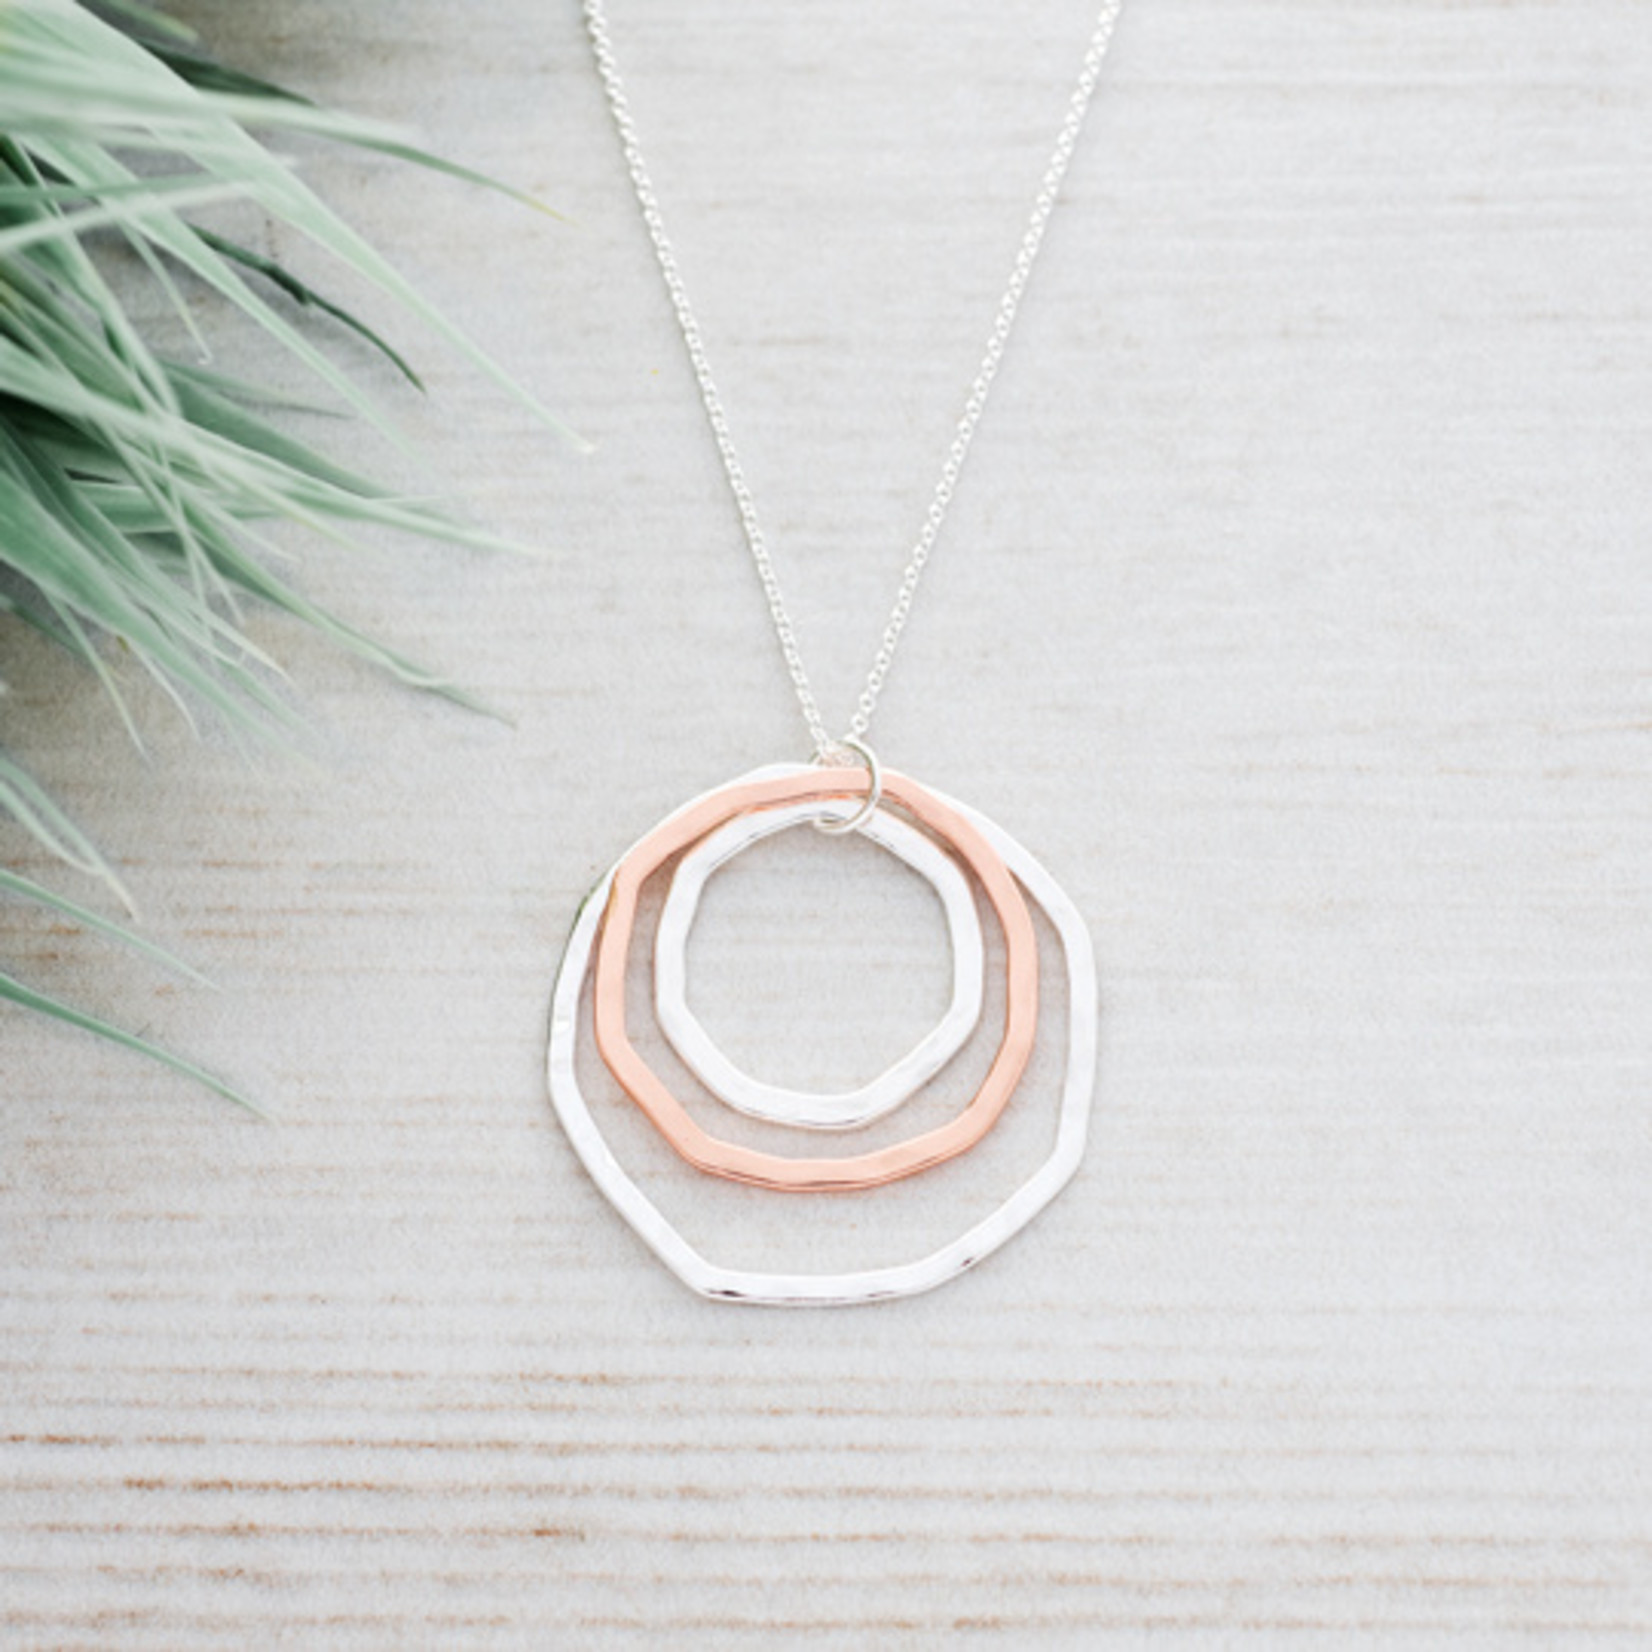 Glee Jewelry ~ Venn Necklace